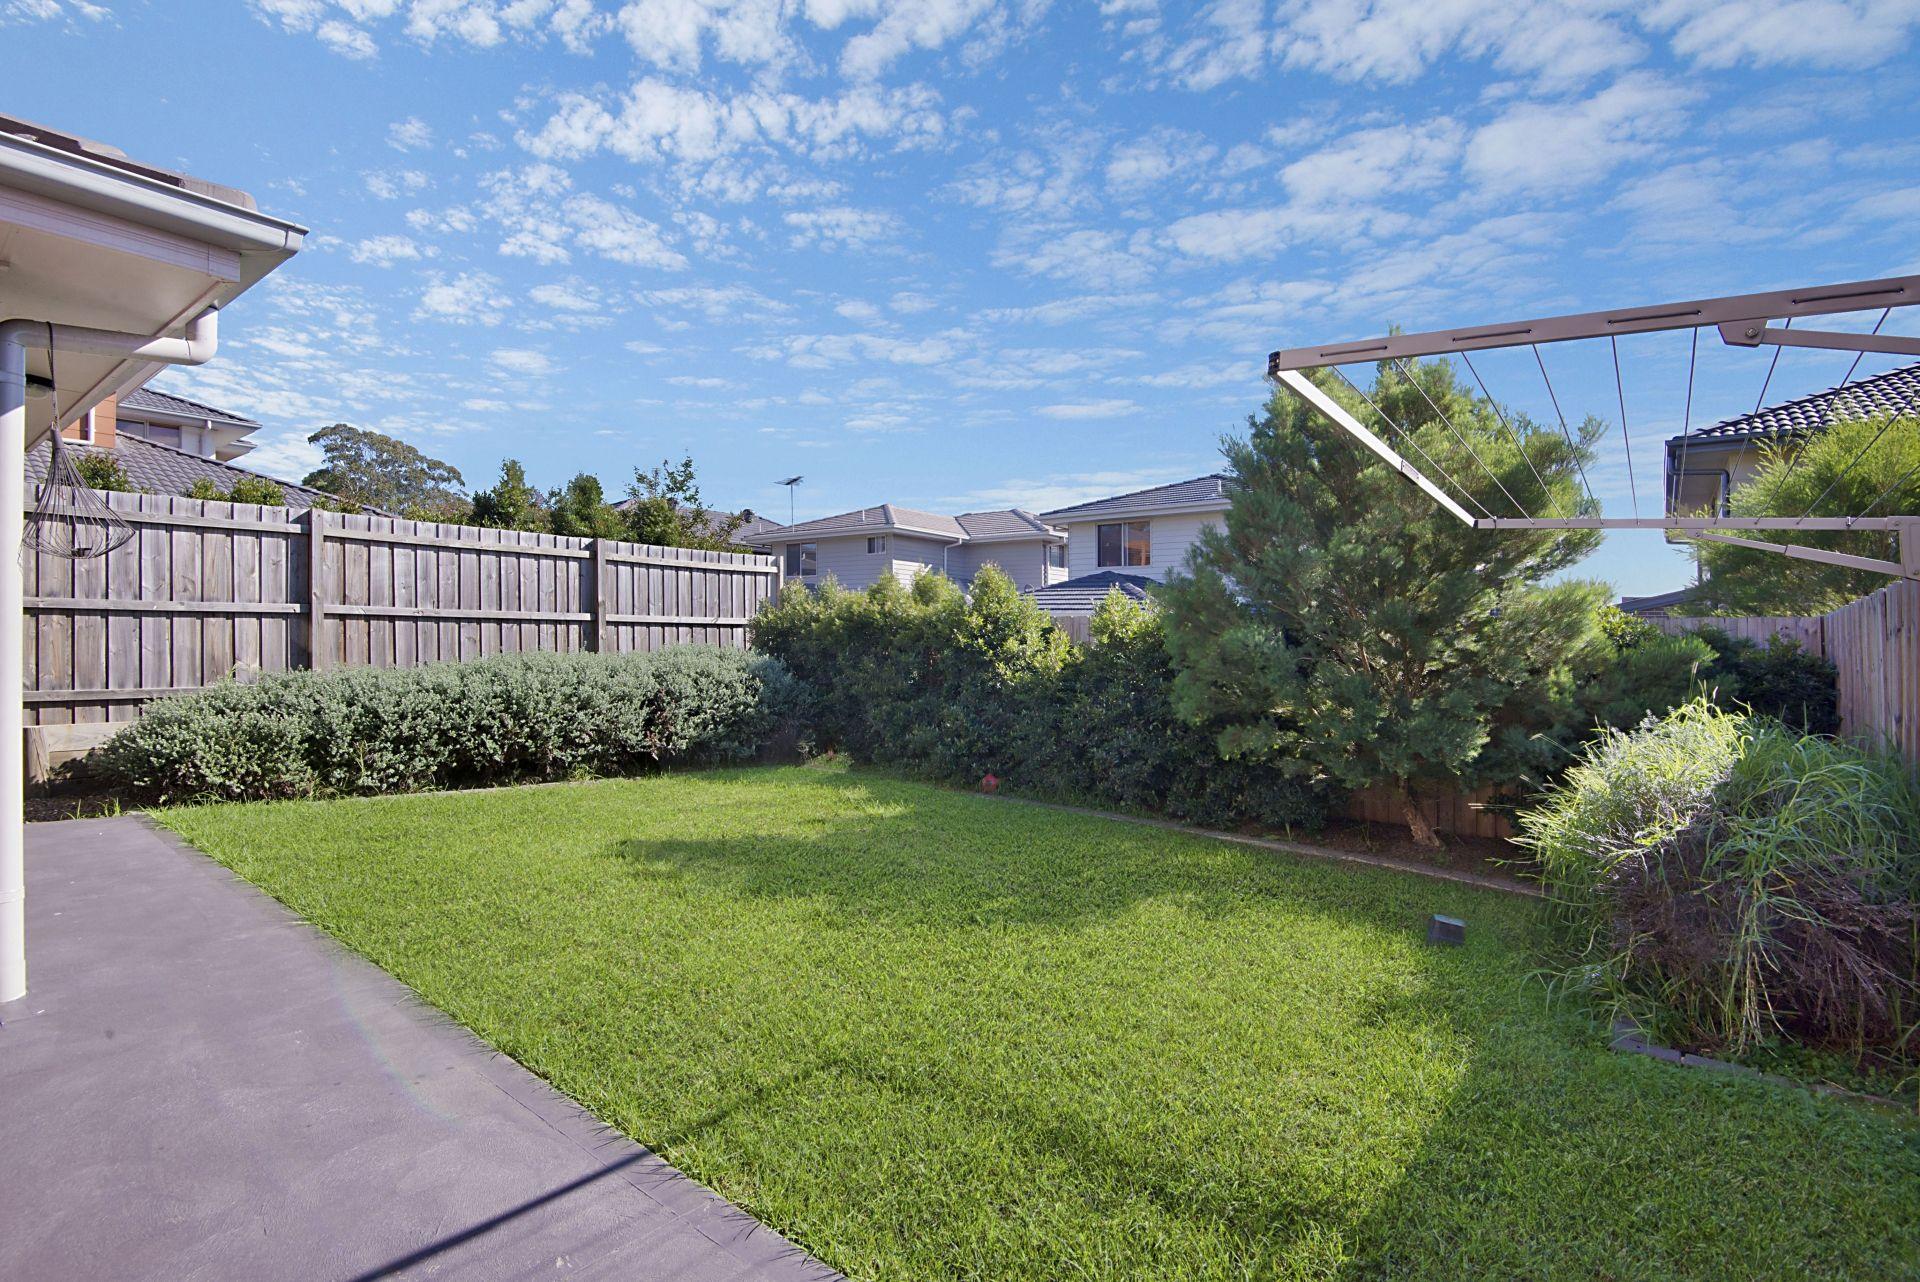 4/6 Birallee Street, The Ponds NSW 2769